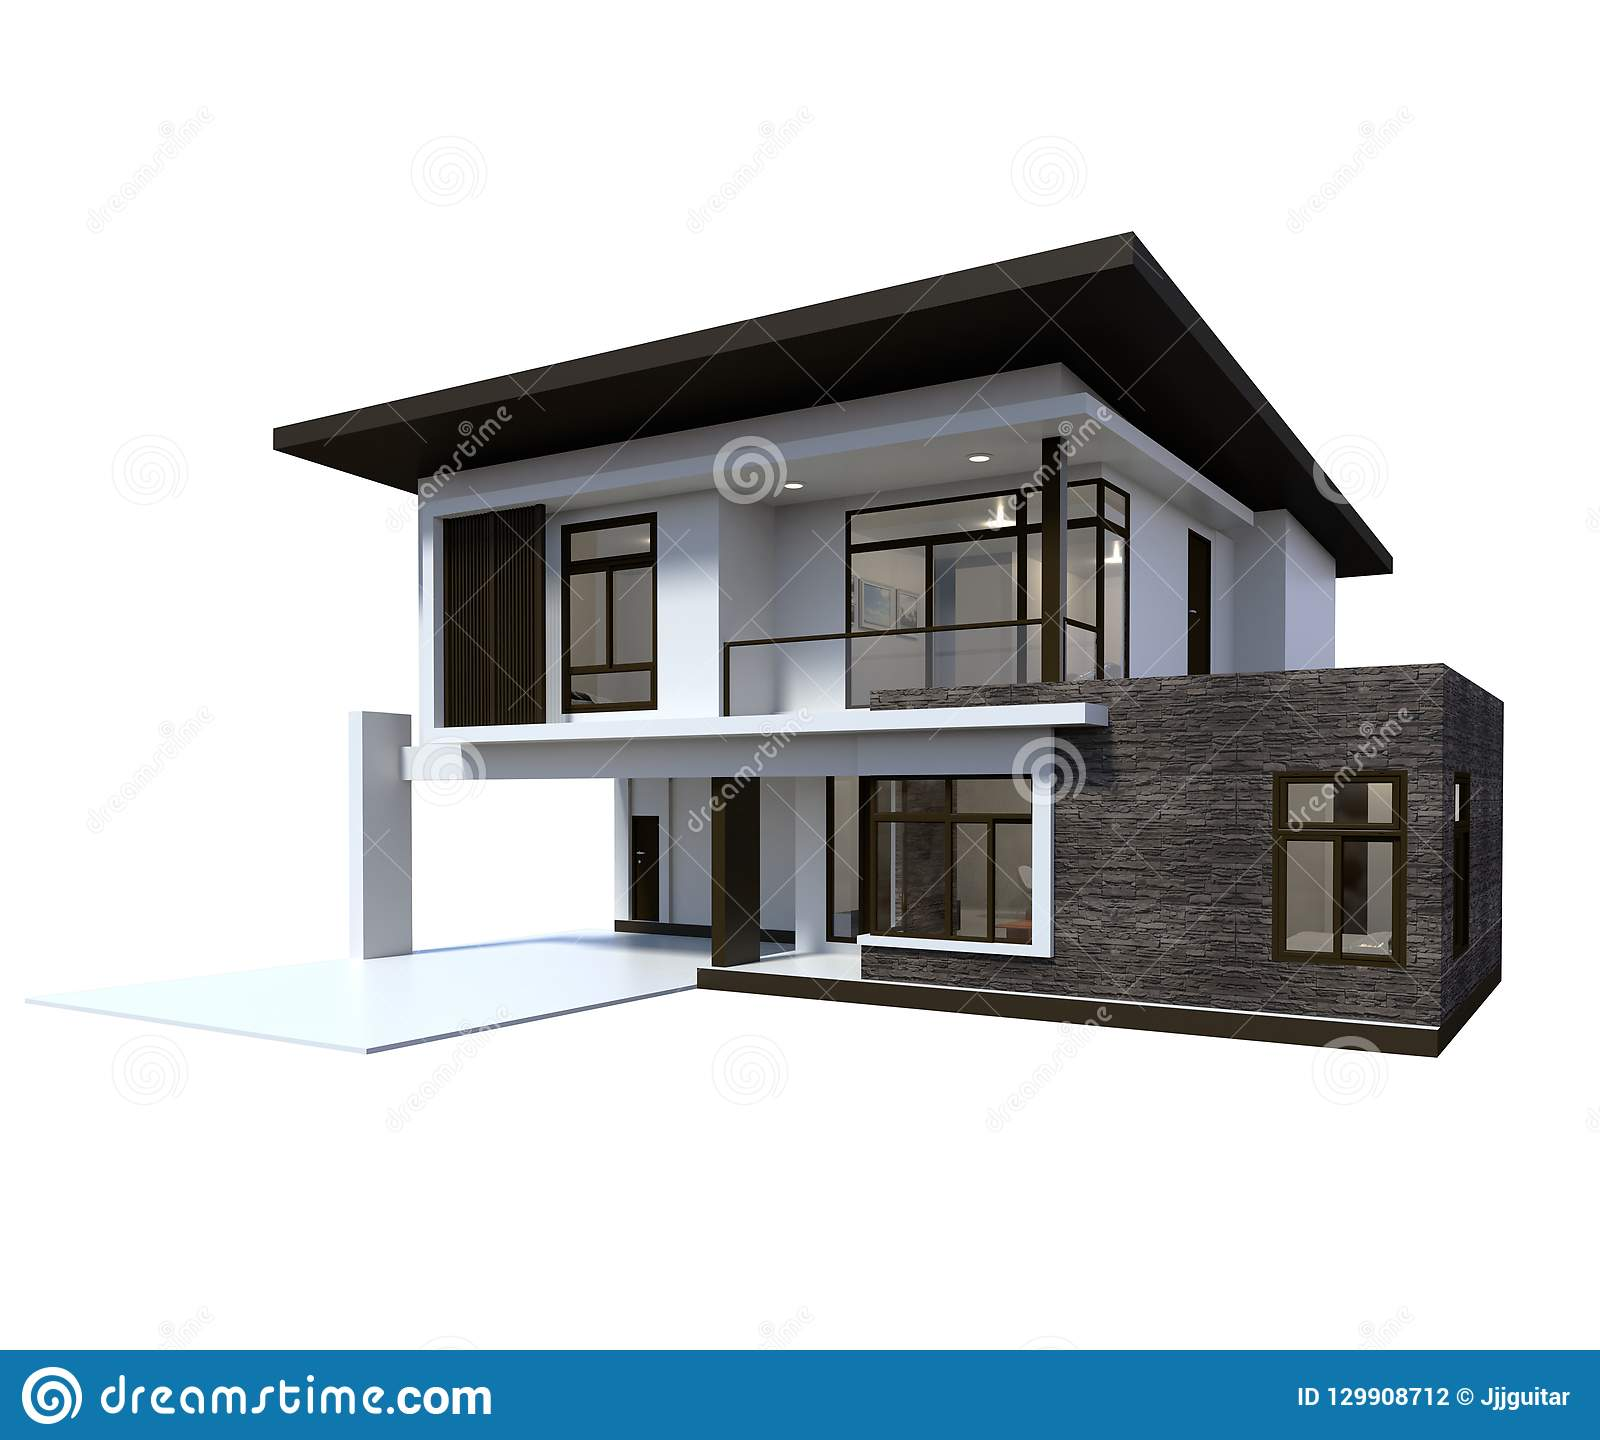 House 3d modern rendering on white background